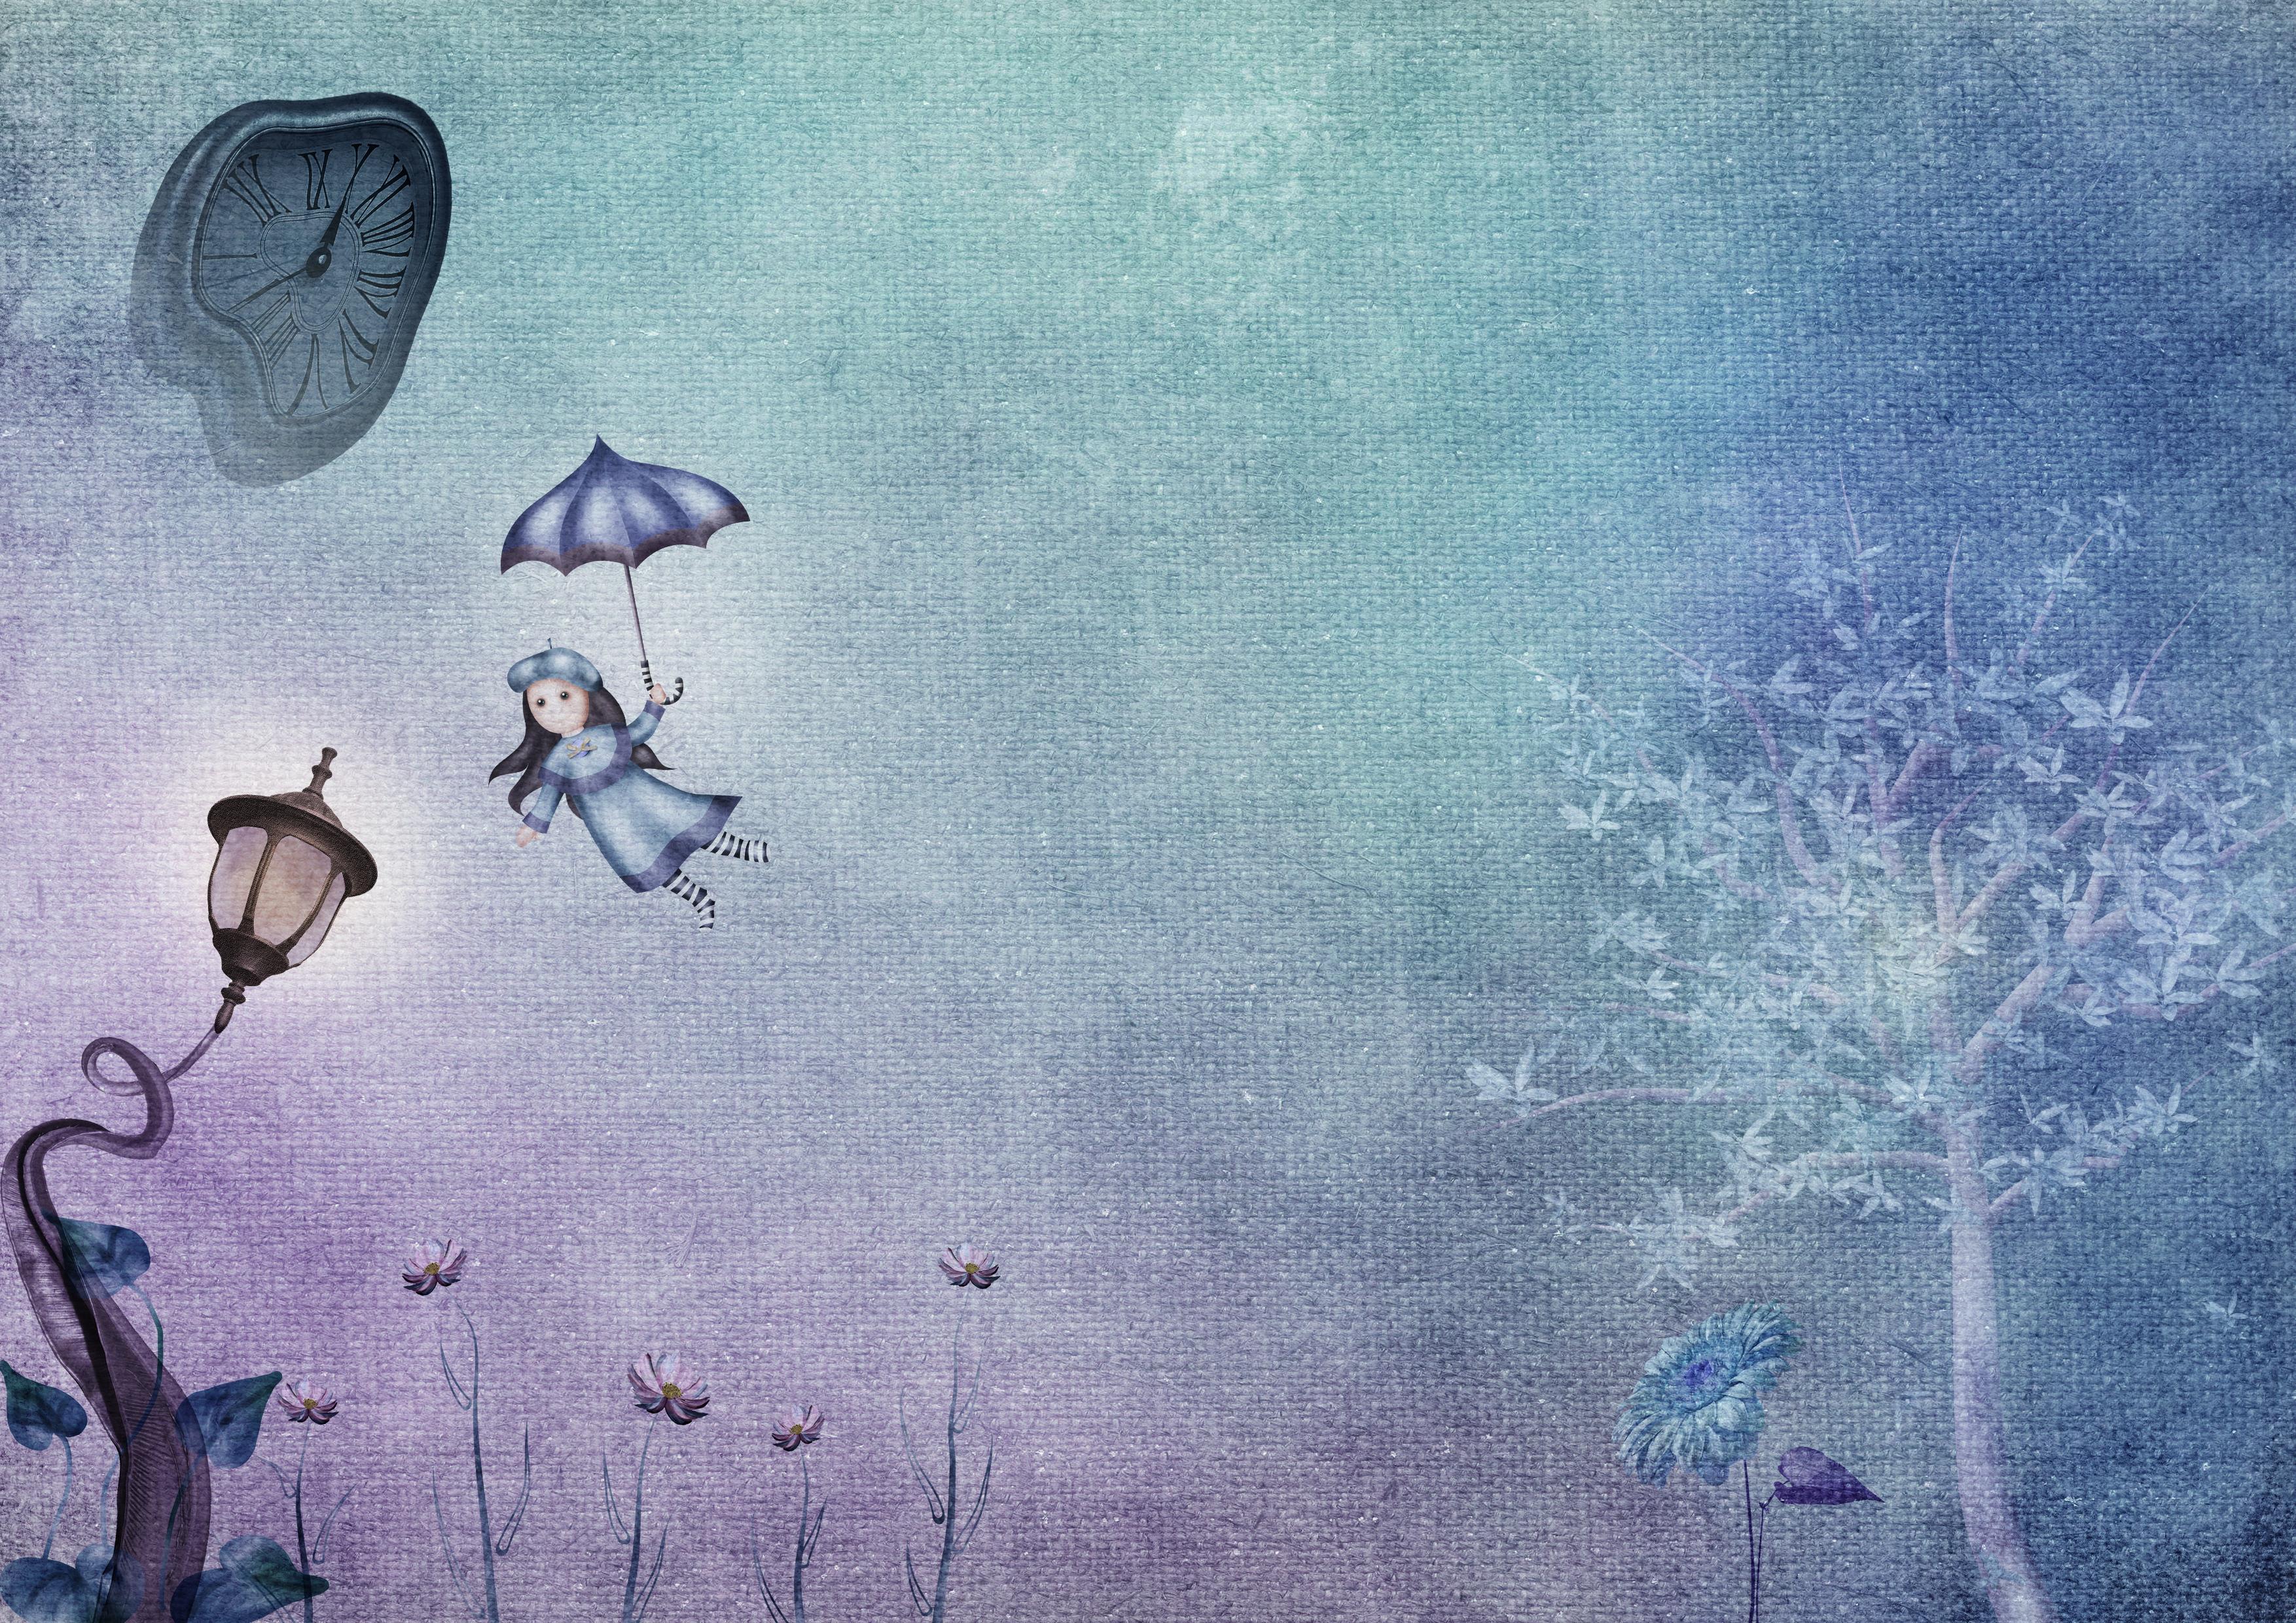 fantasy-clock-tree-lamp-girl-umbrella-li